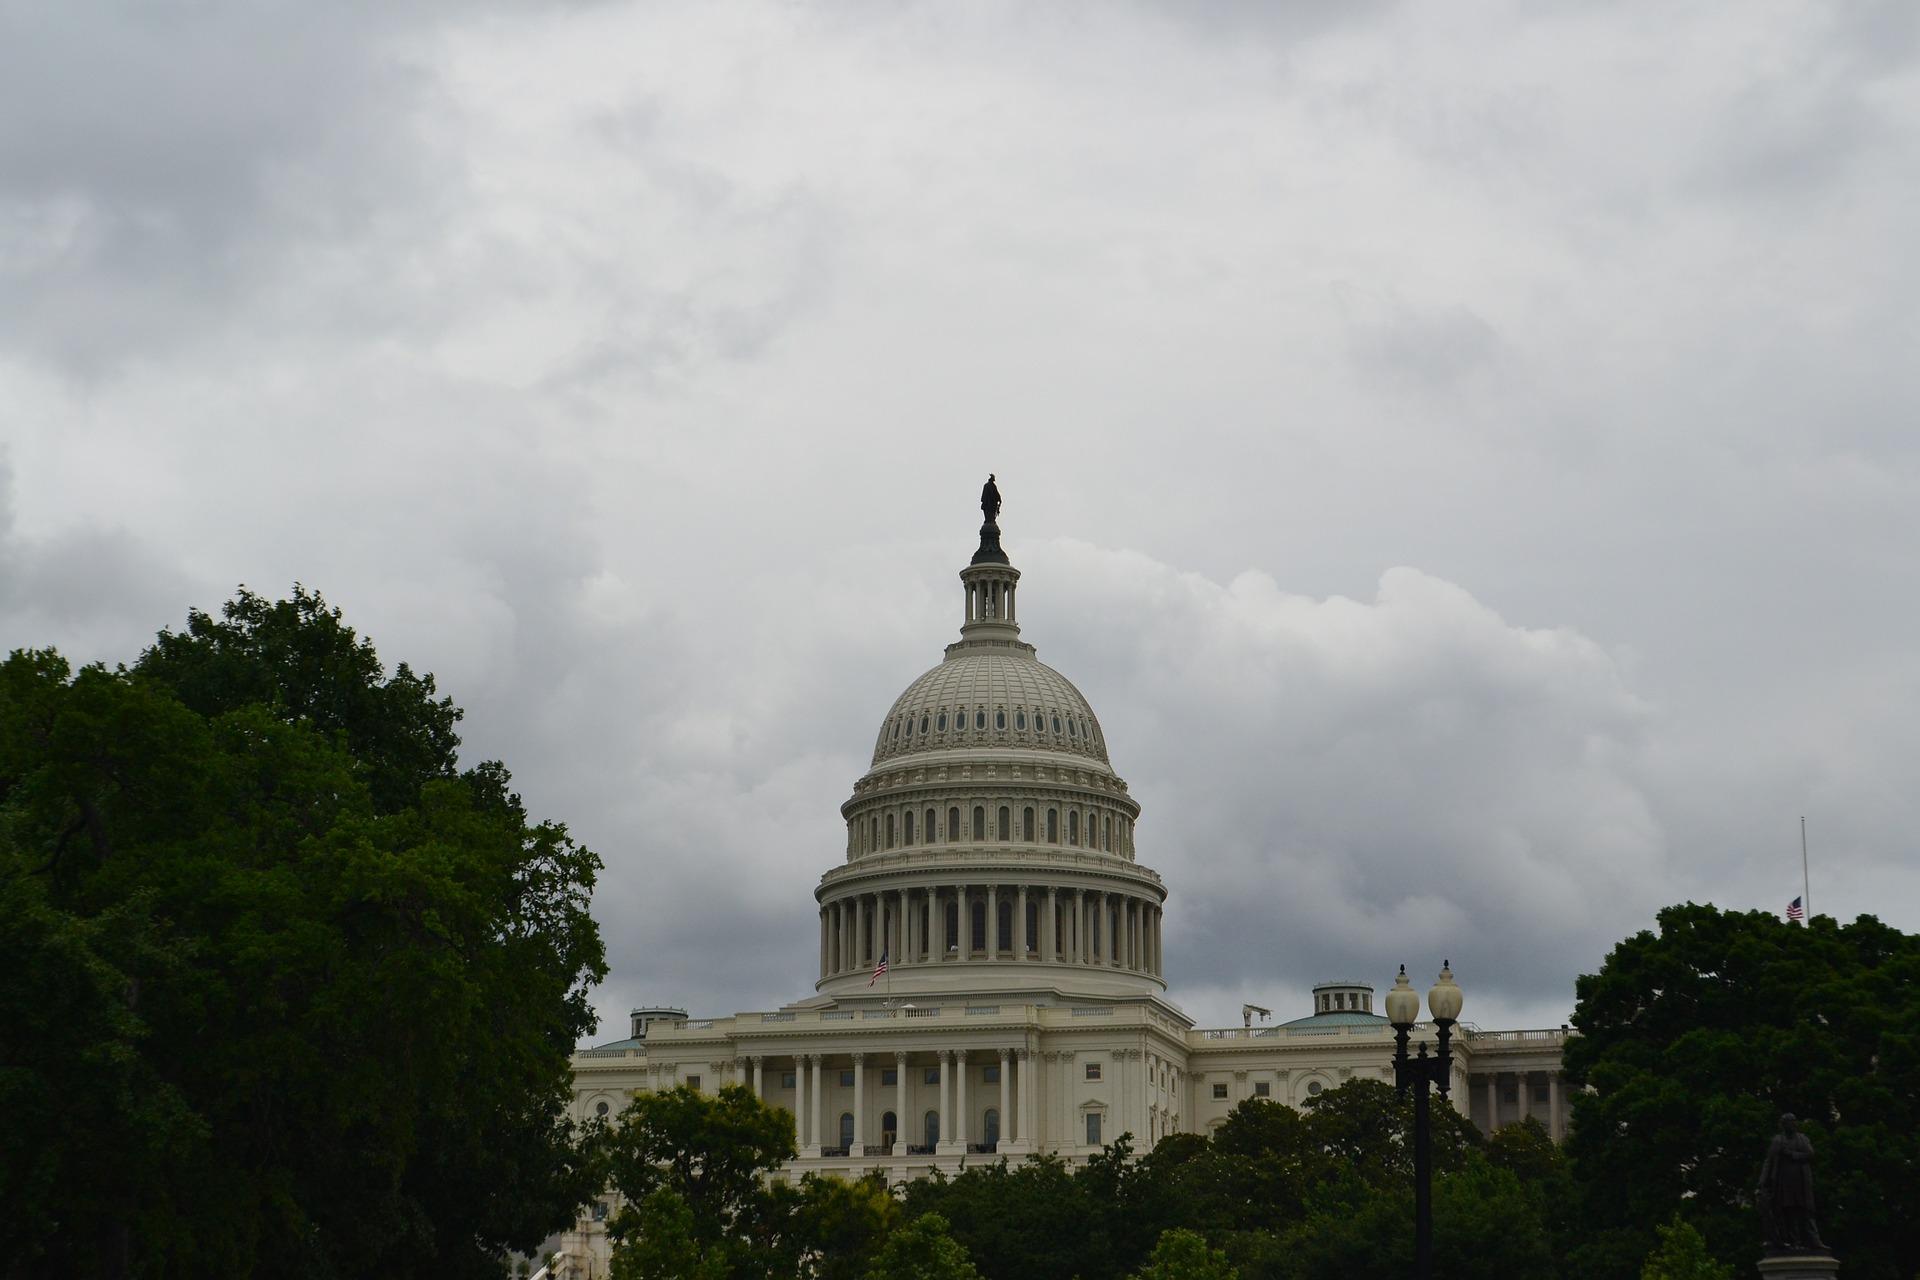 capitol-building-500528_1920